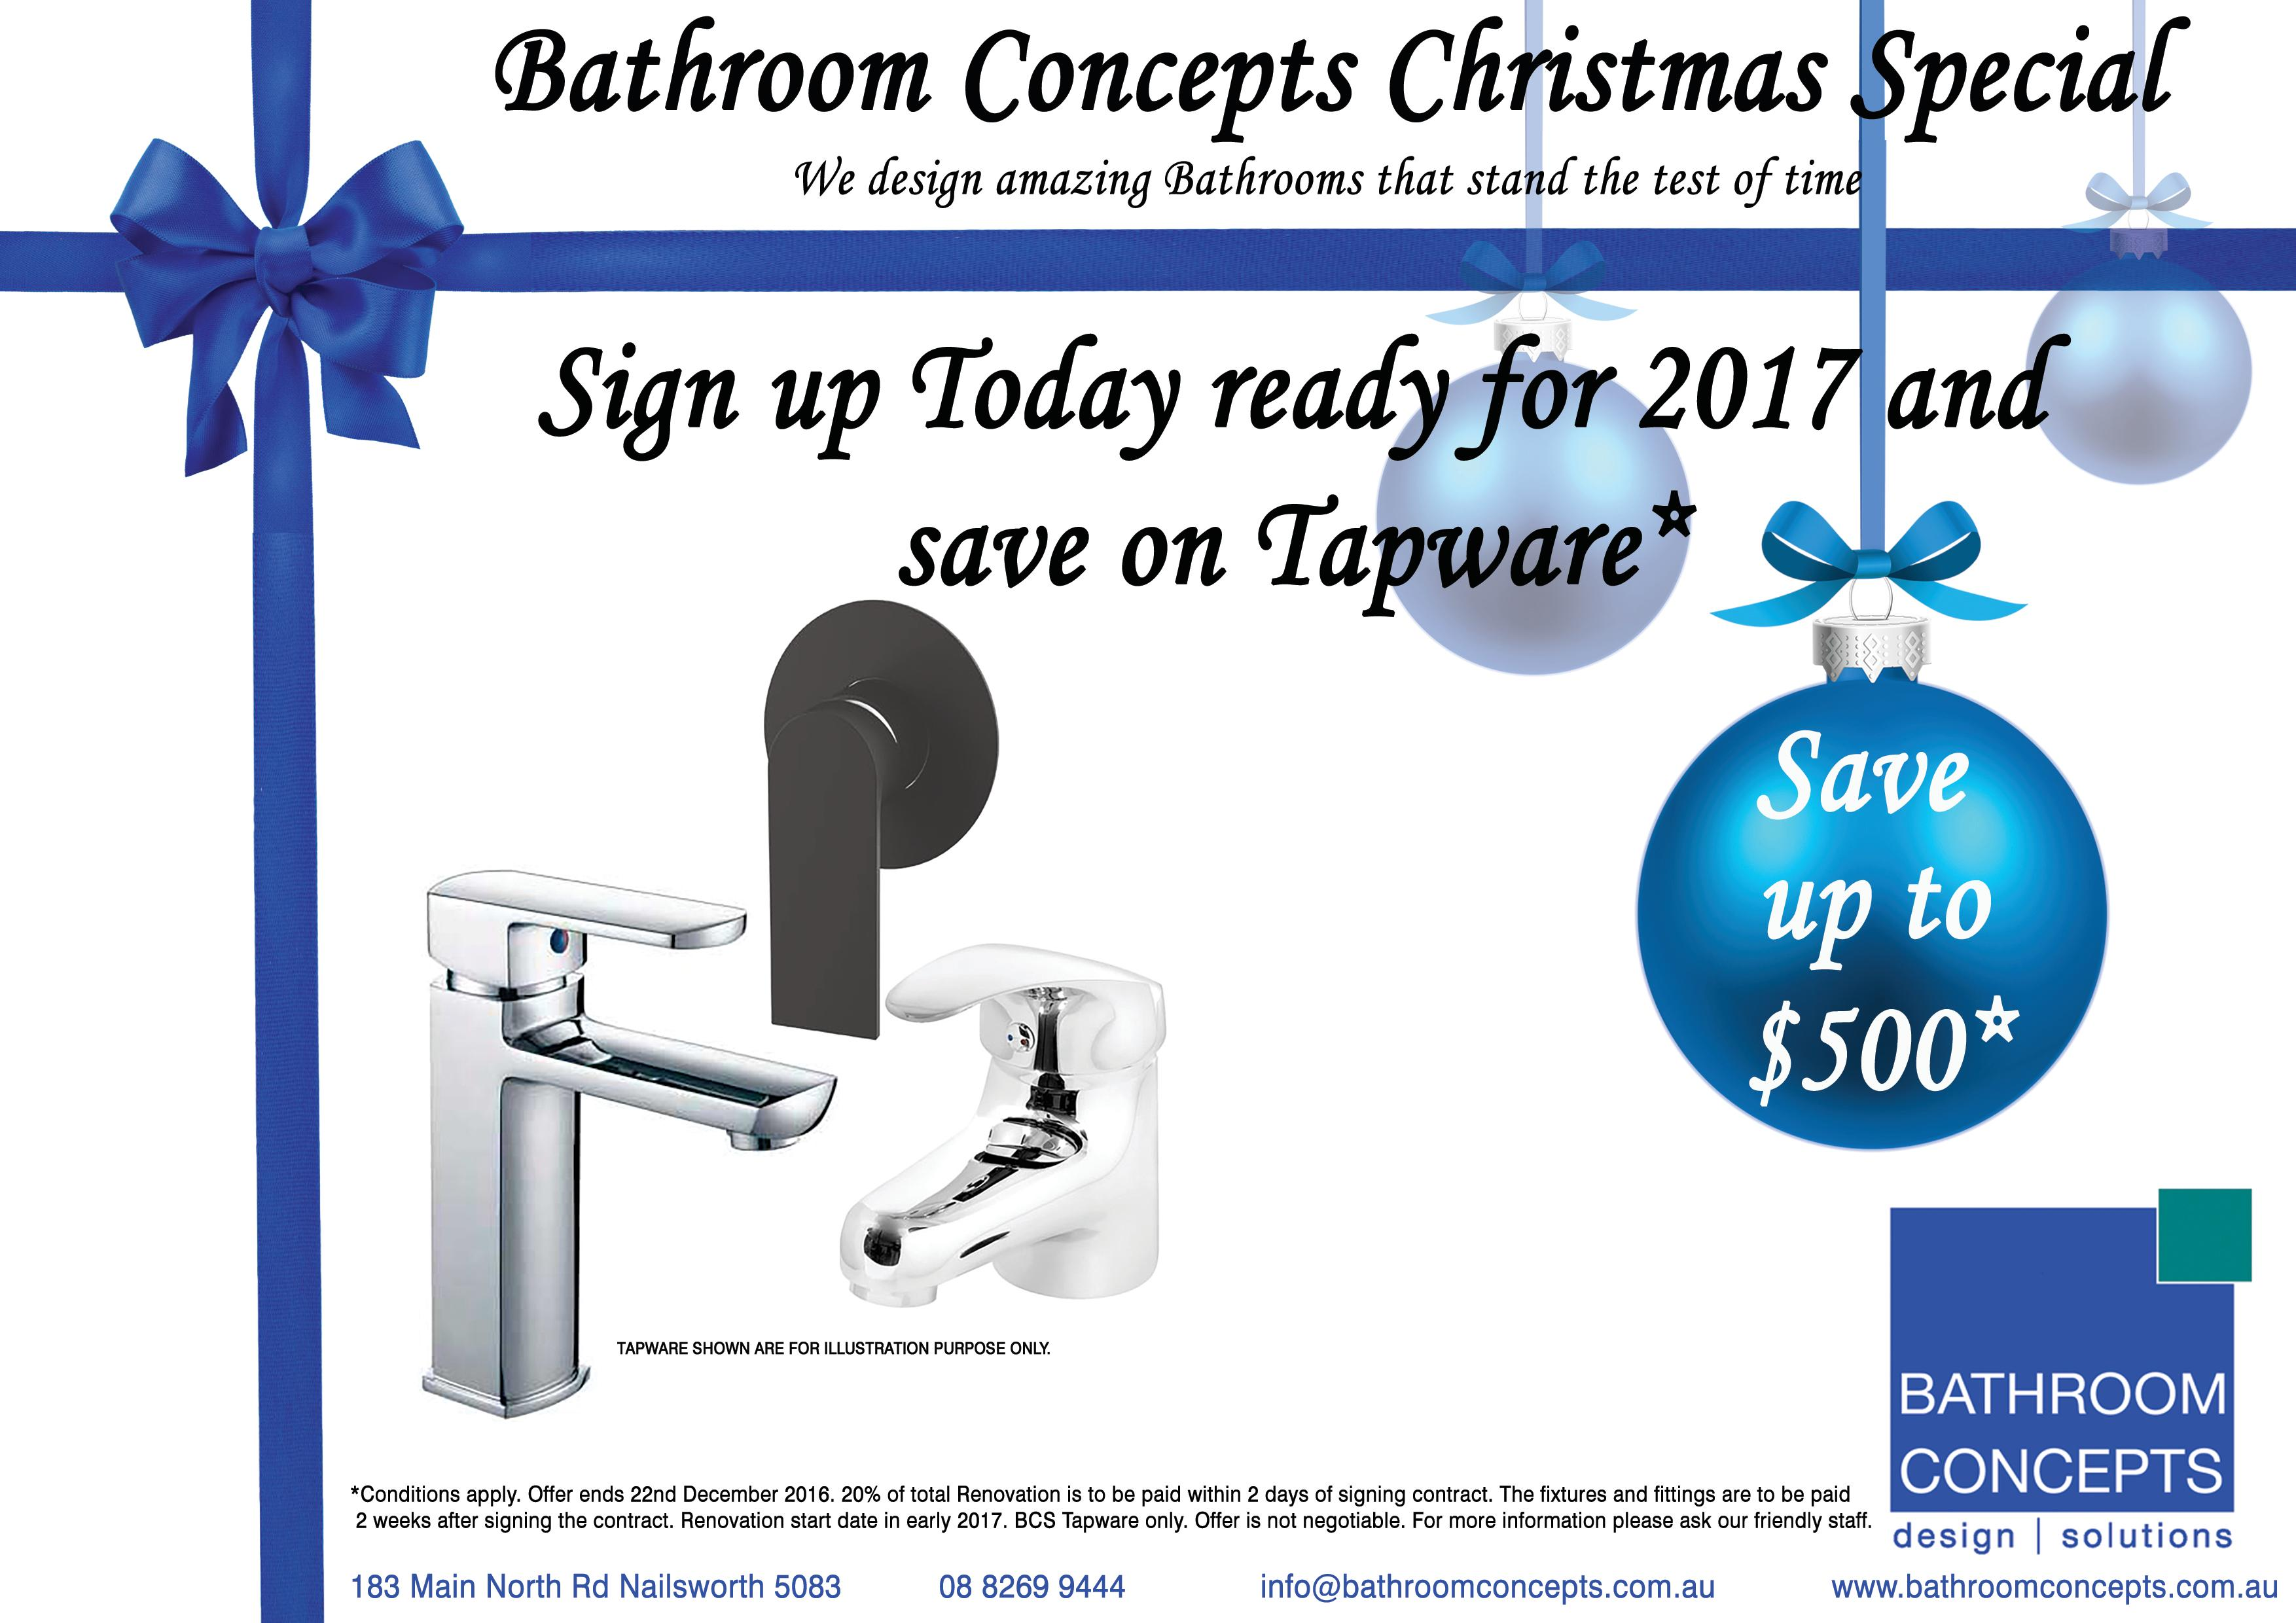 Bathroom Concepts Christmas Special